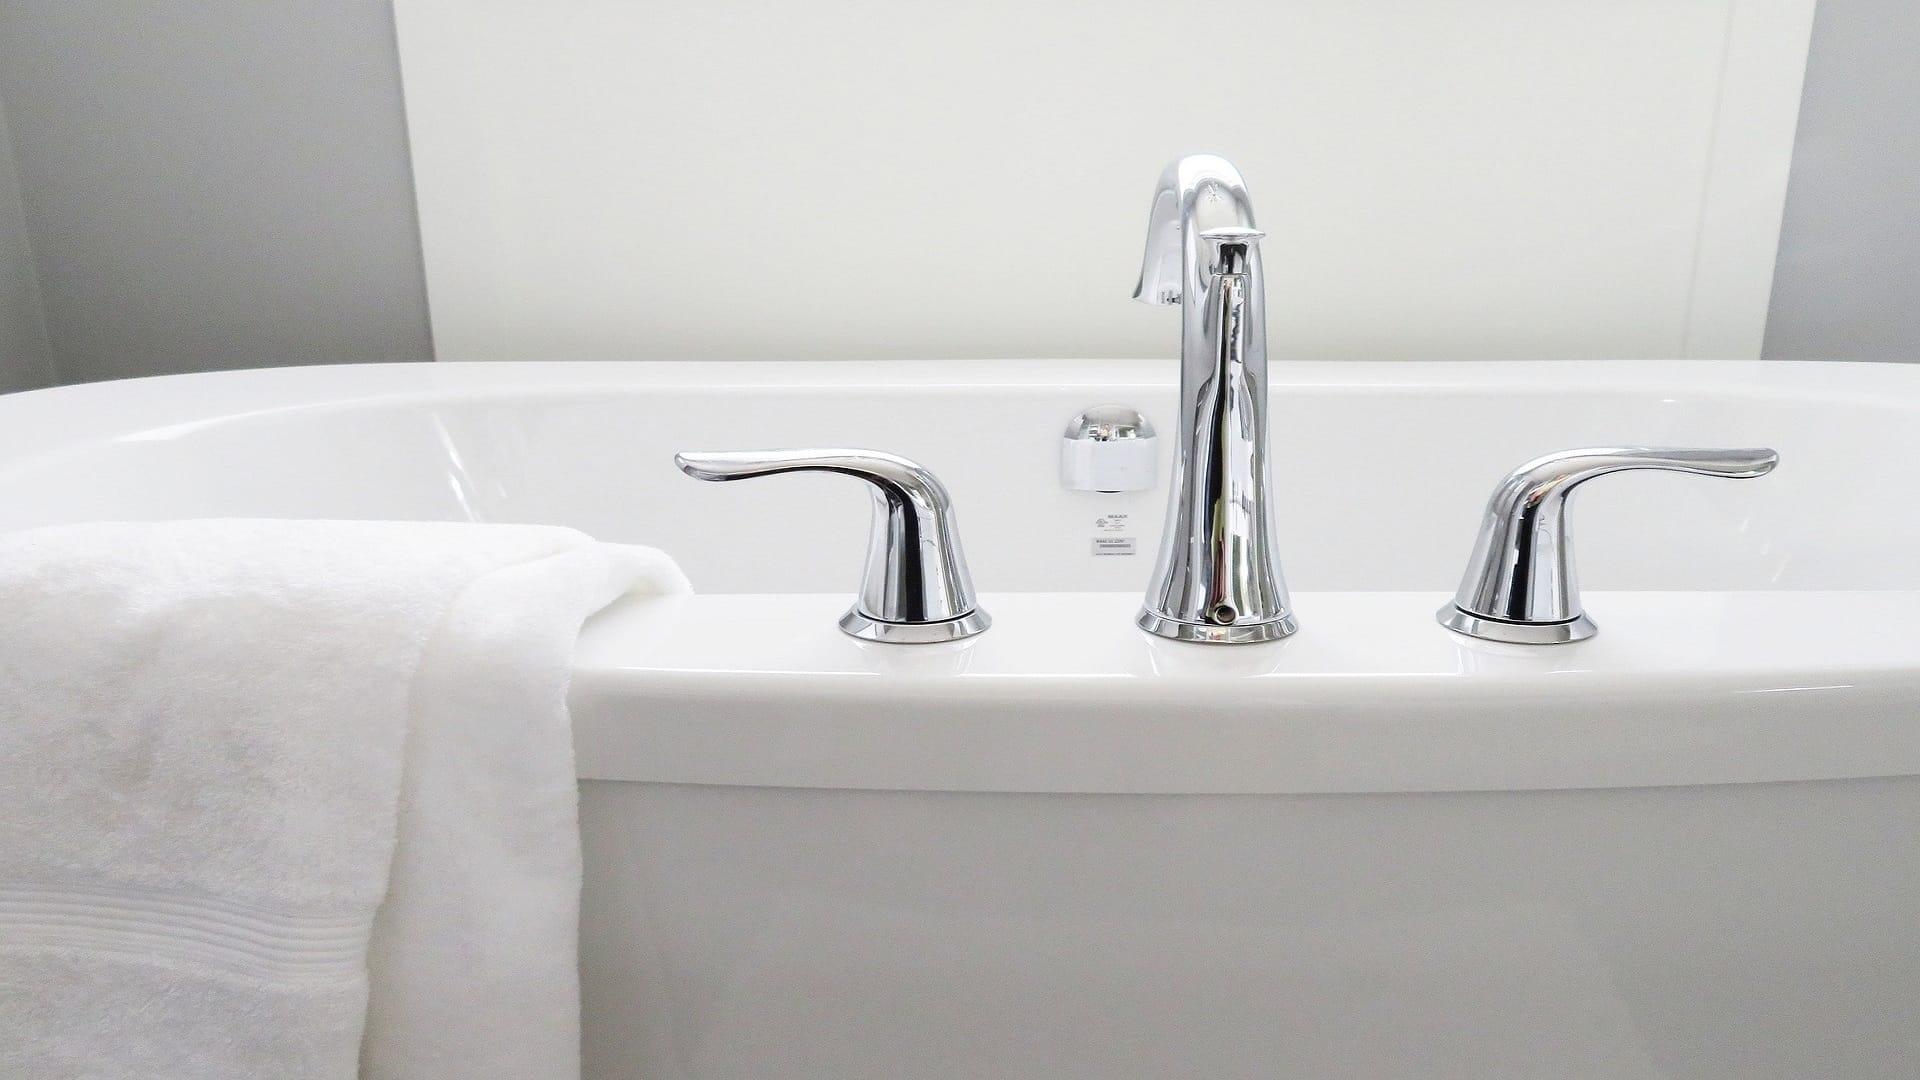 Quanto costa rismaltatura vasca da bagno rismaltatura vasca da